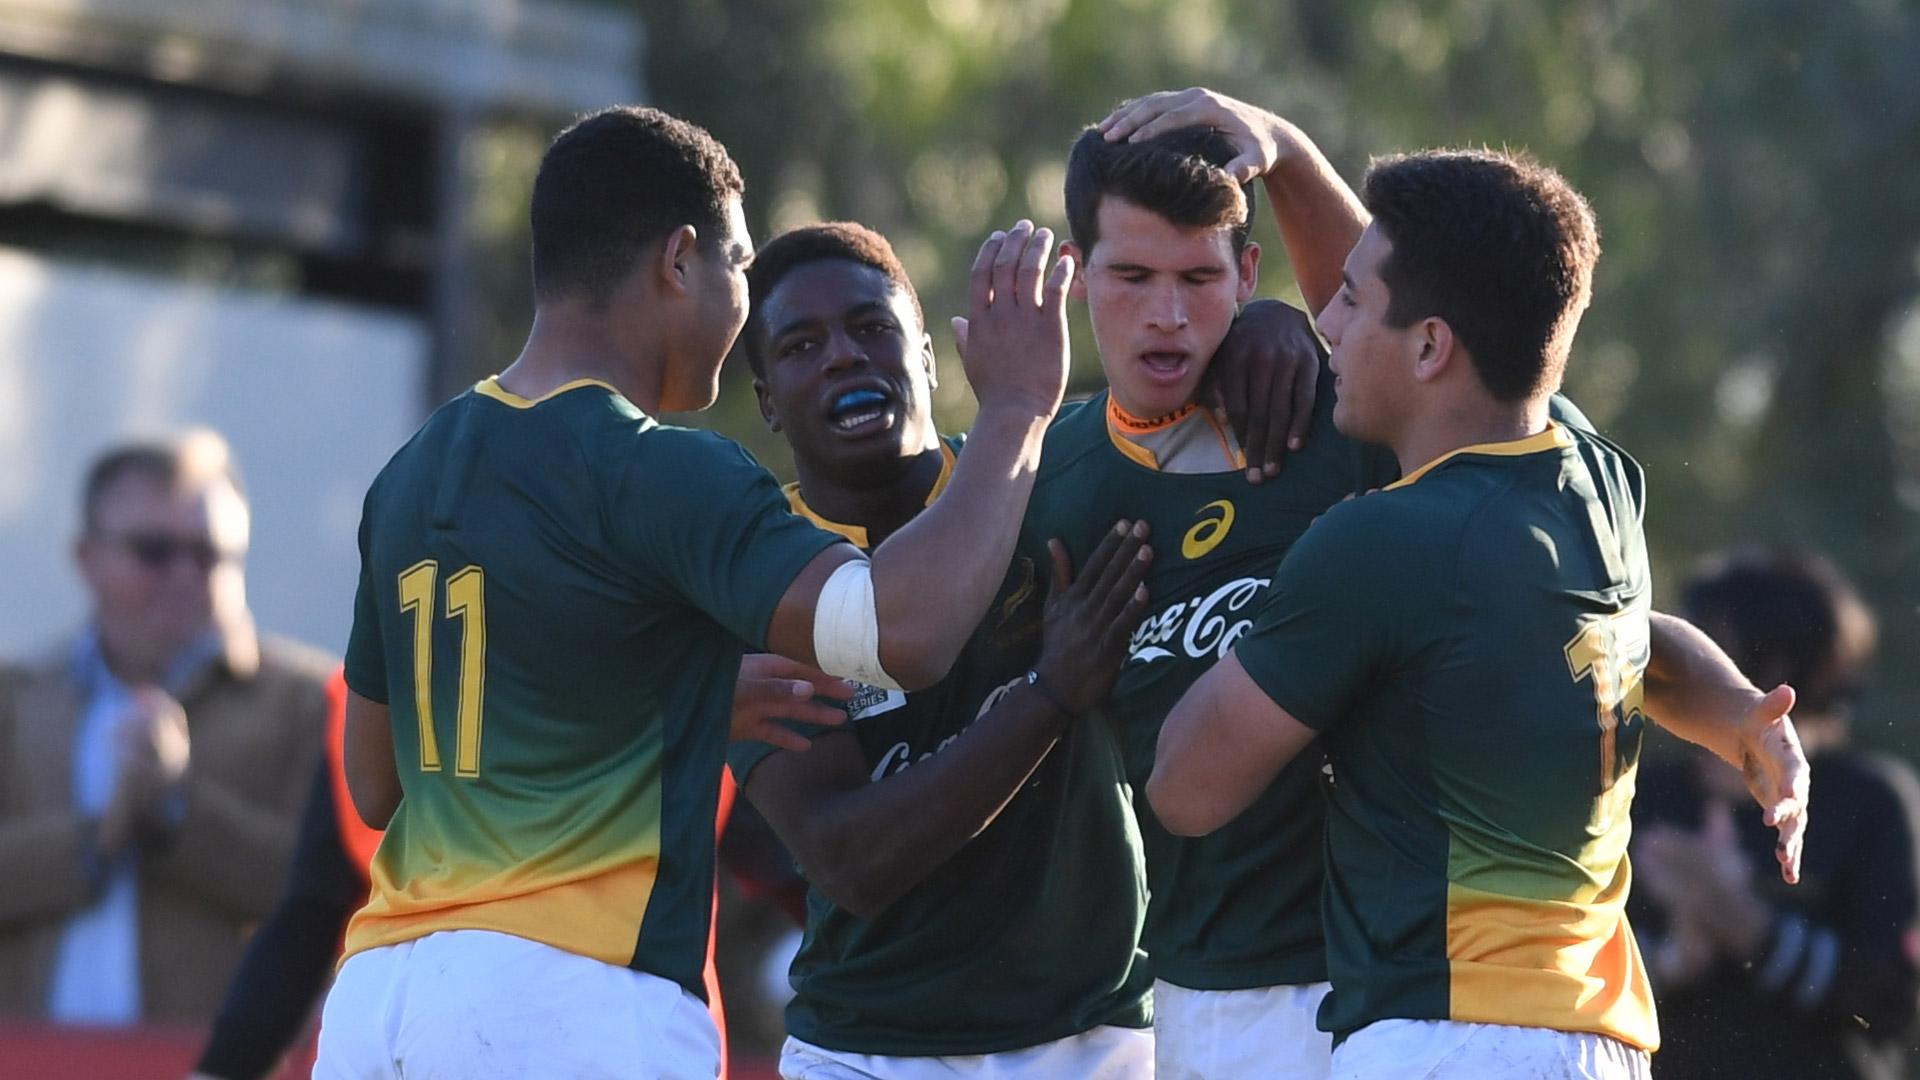 SA Under-19 team to face Georgia Under-19s - Sports Leo